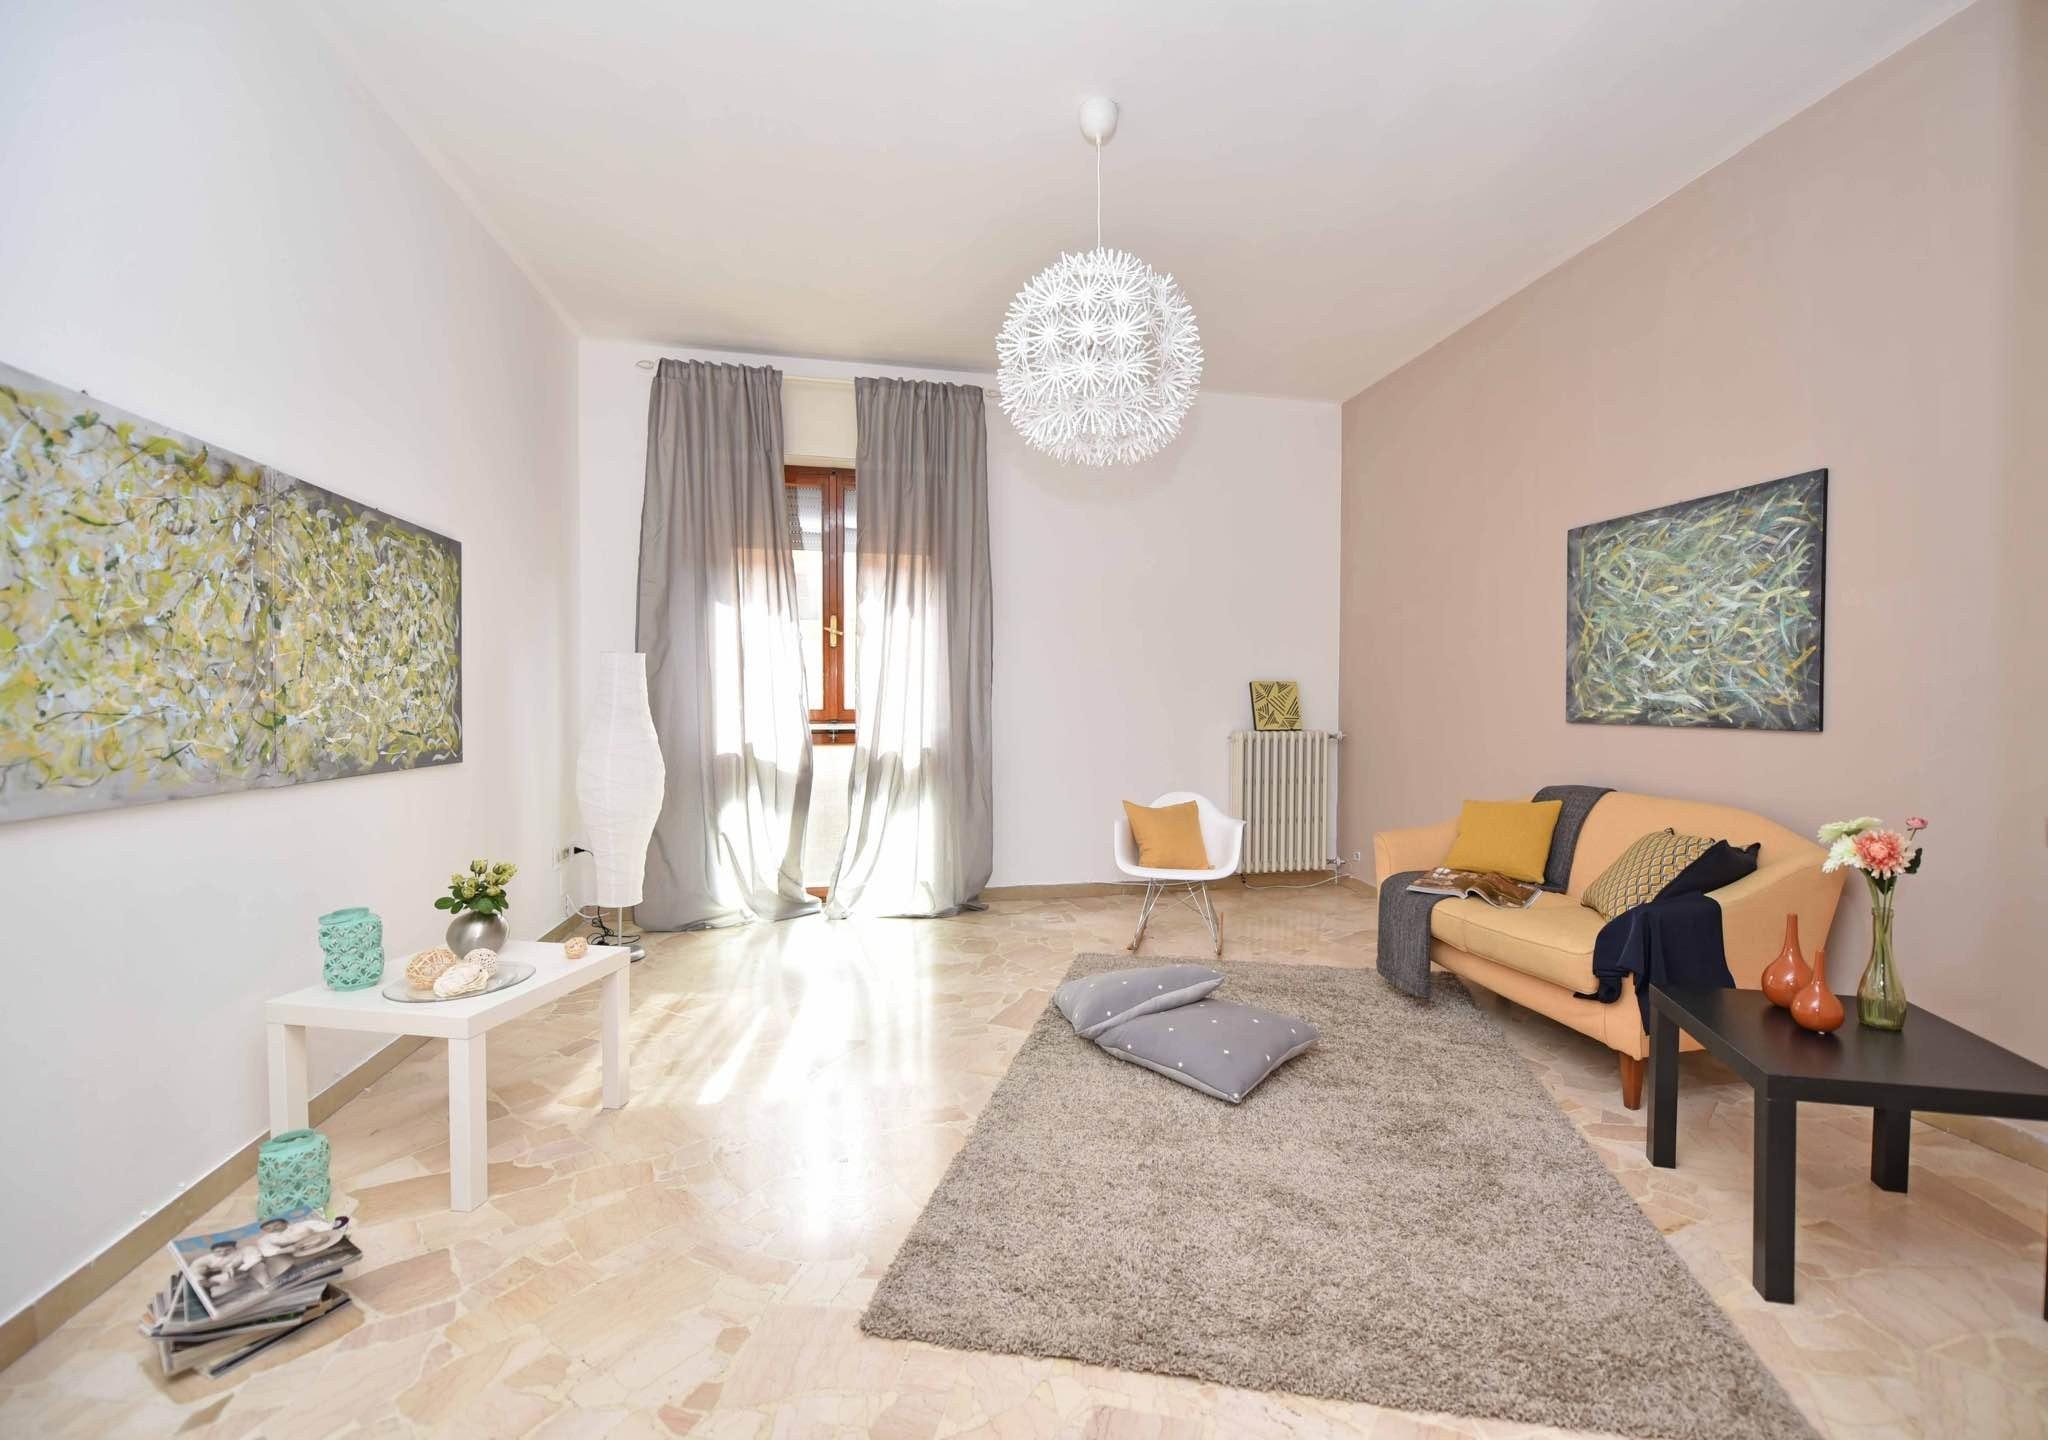 hotel carpet rug manufacturers in India